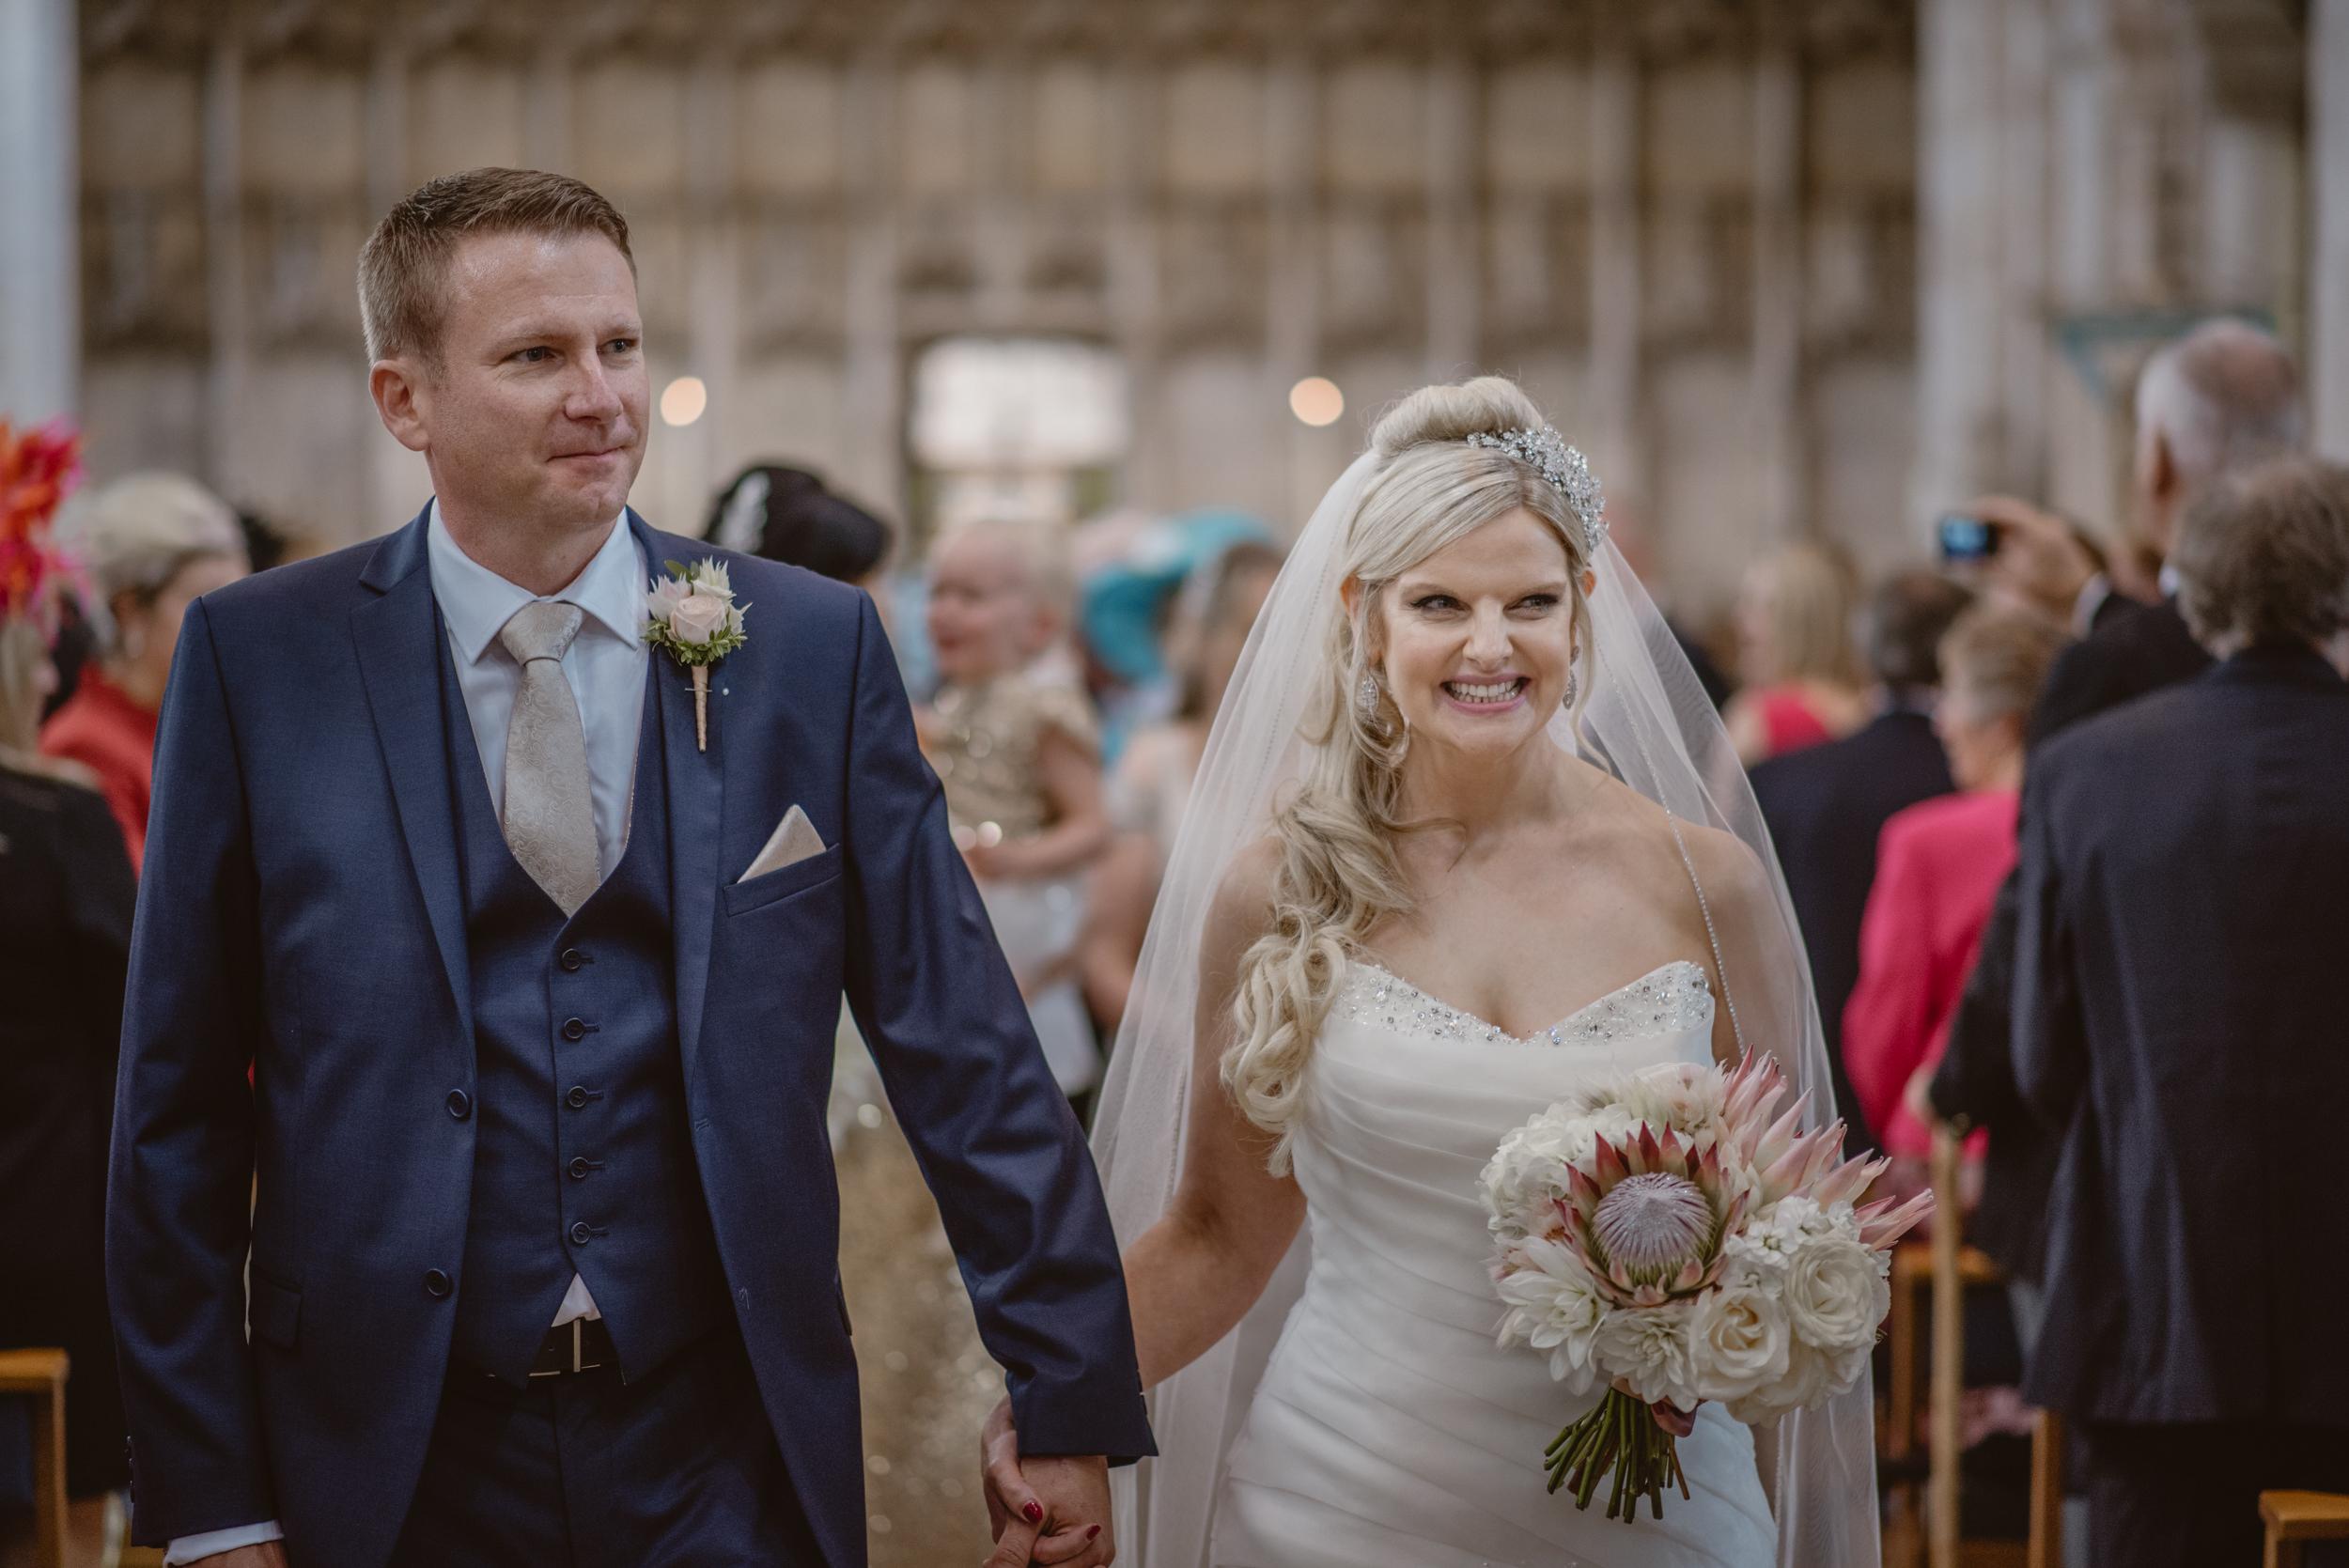 Trisha-and-Roger-wedding-The-Priory-Church-and-Chewton-Glen-Hotel-Christchurch-Manu-Mendoza-Wedding-Photography-197.jpg